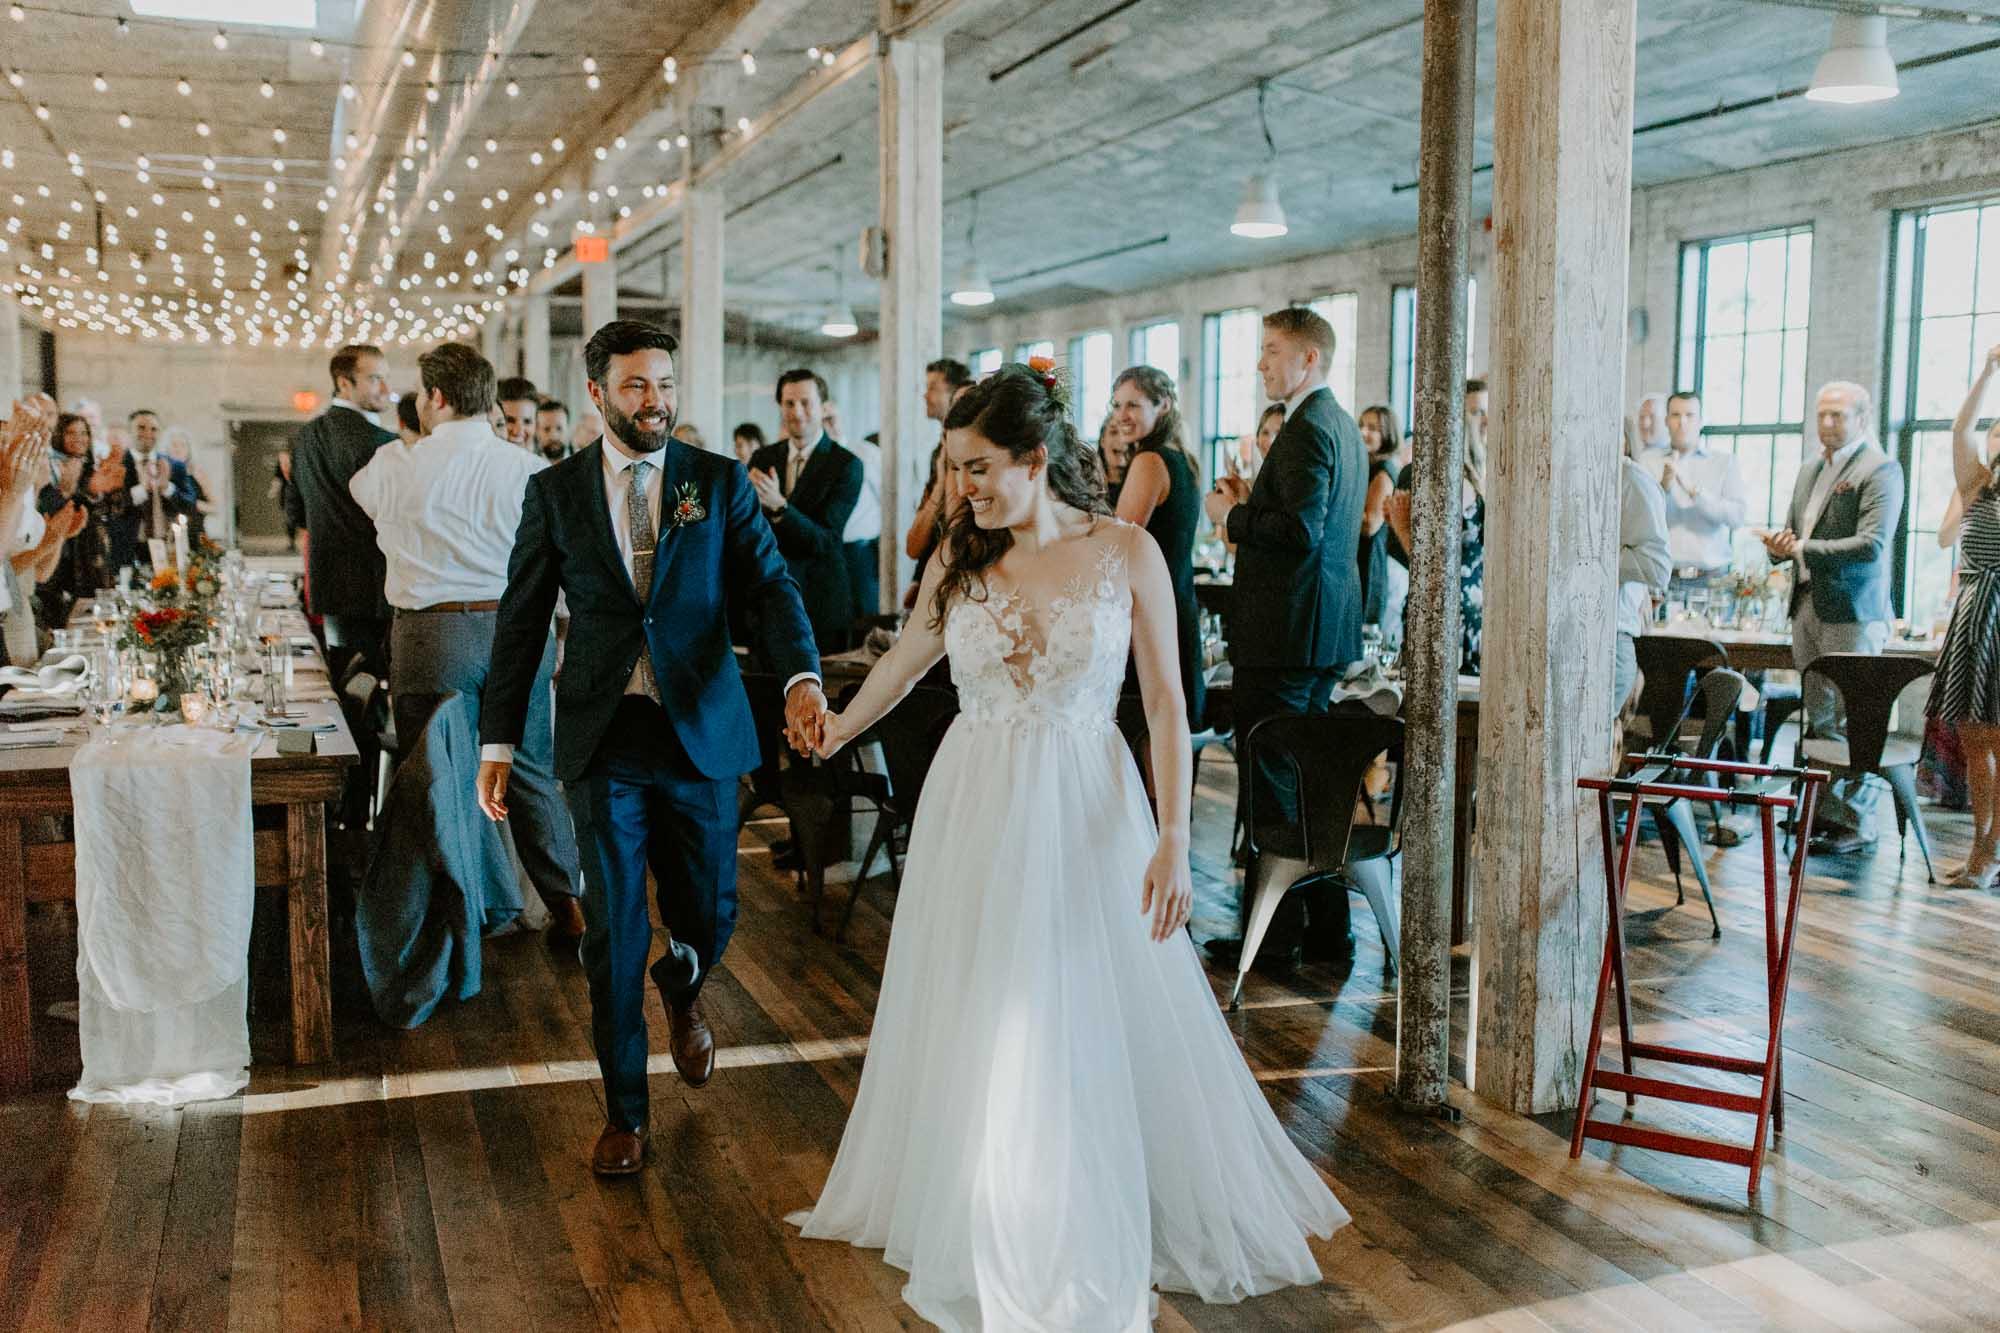 journeyman_distillery_wedding_photographer_chicago_il_wright_photographs-4959.jpg